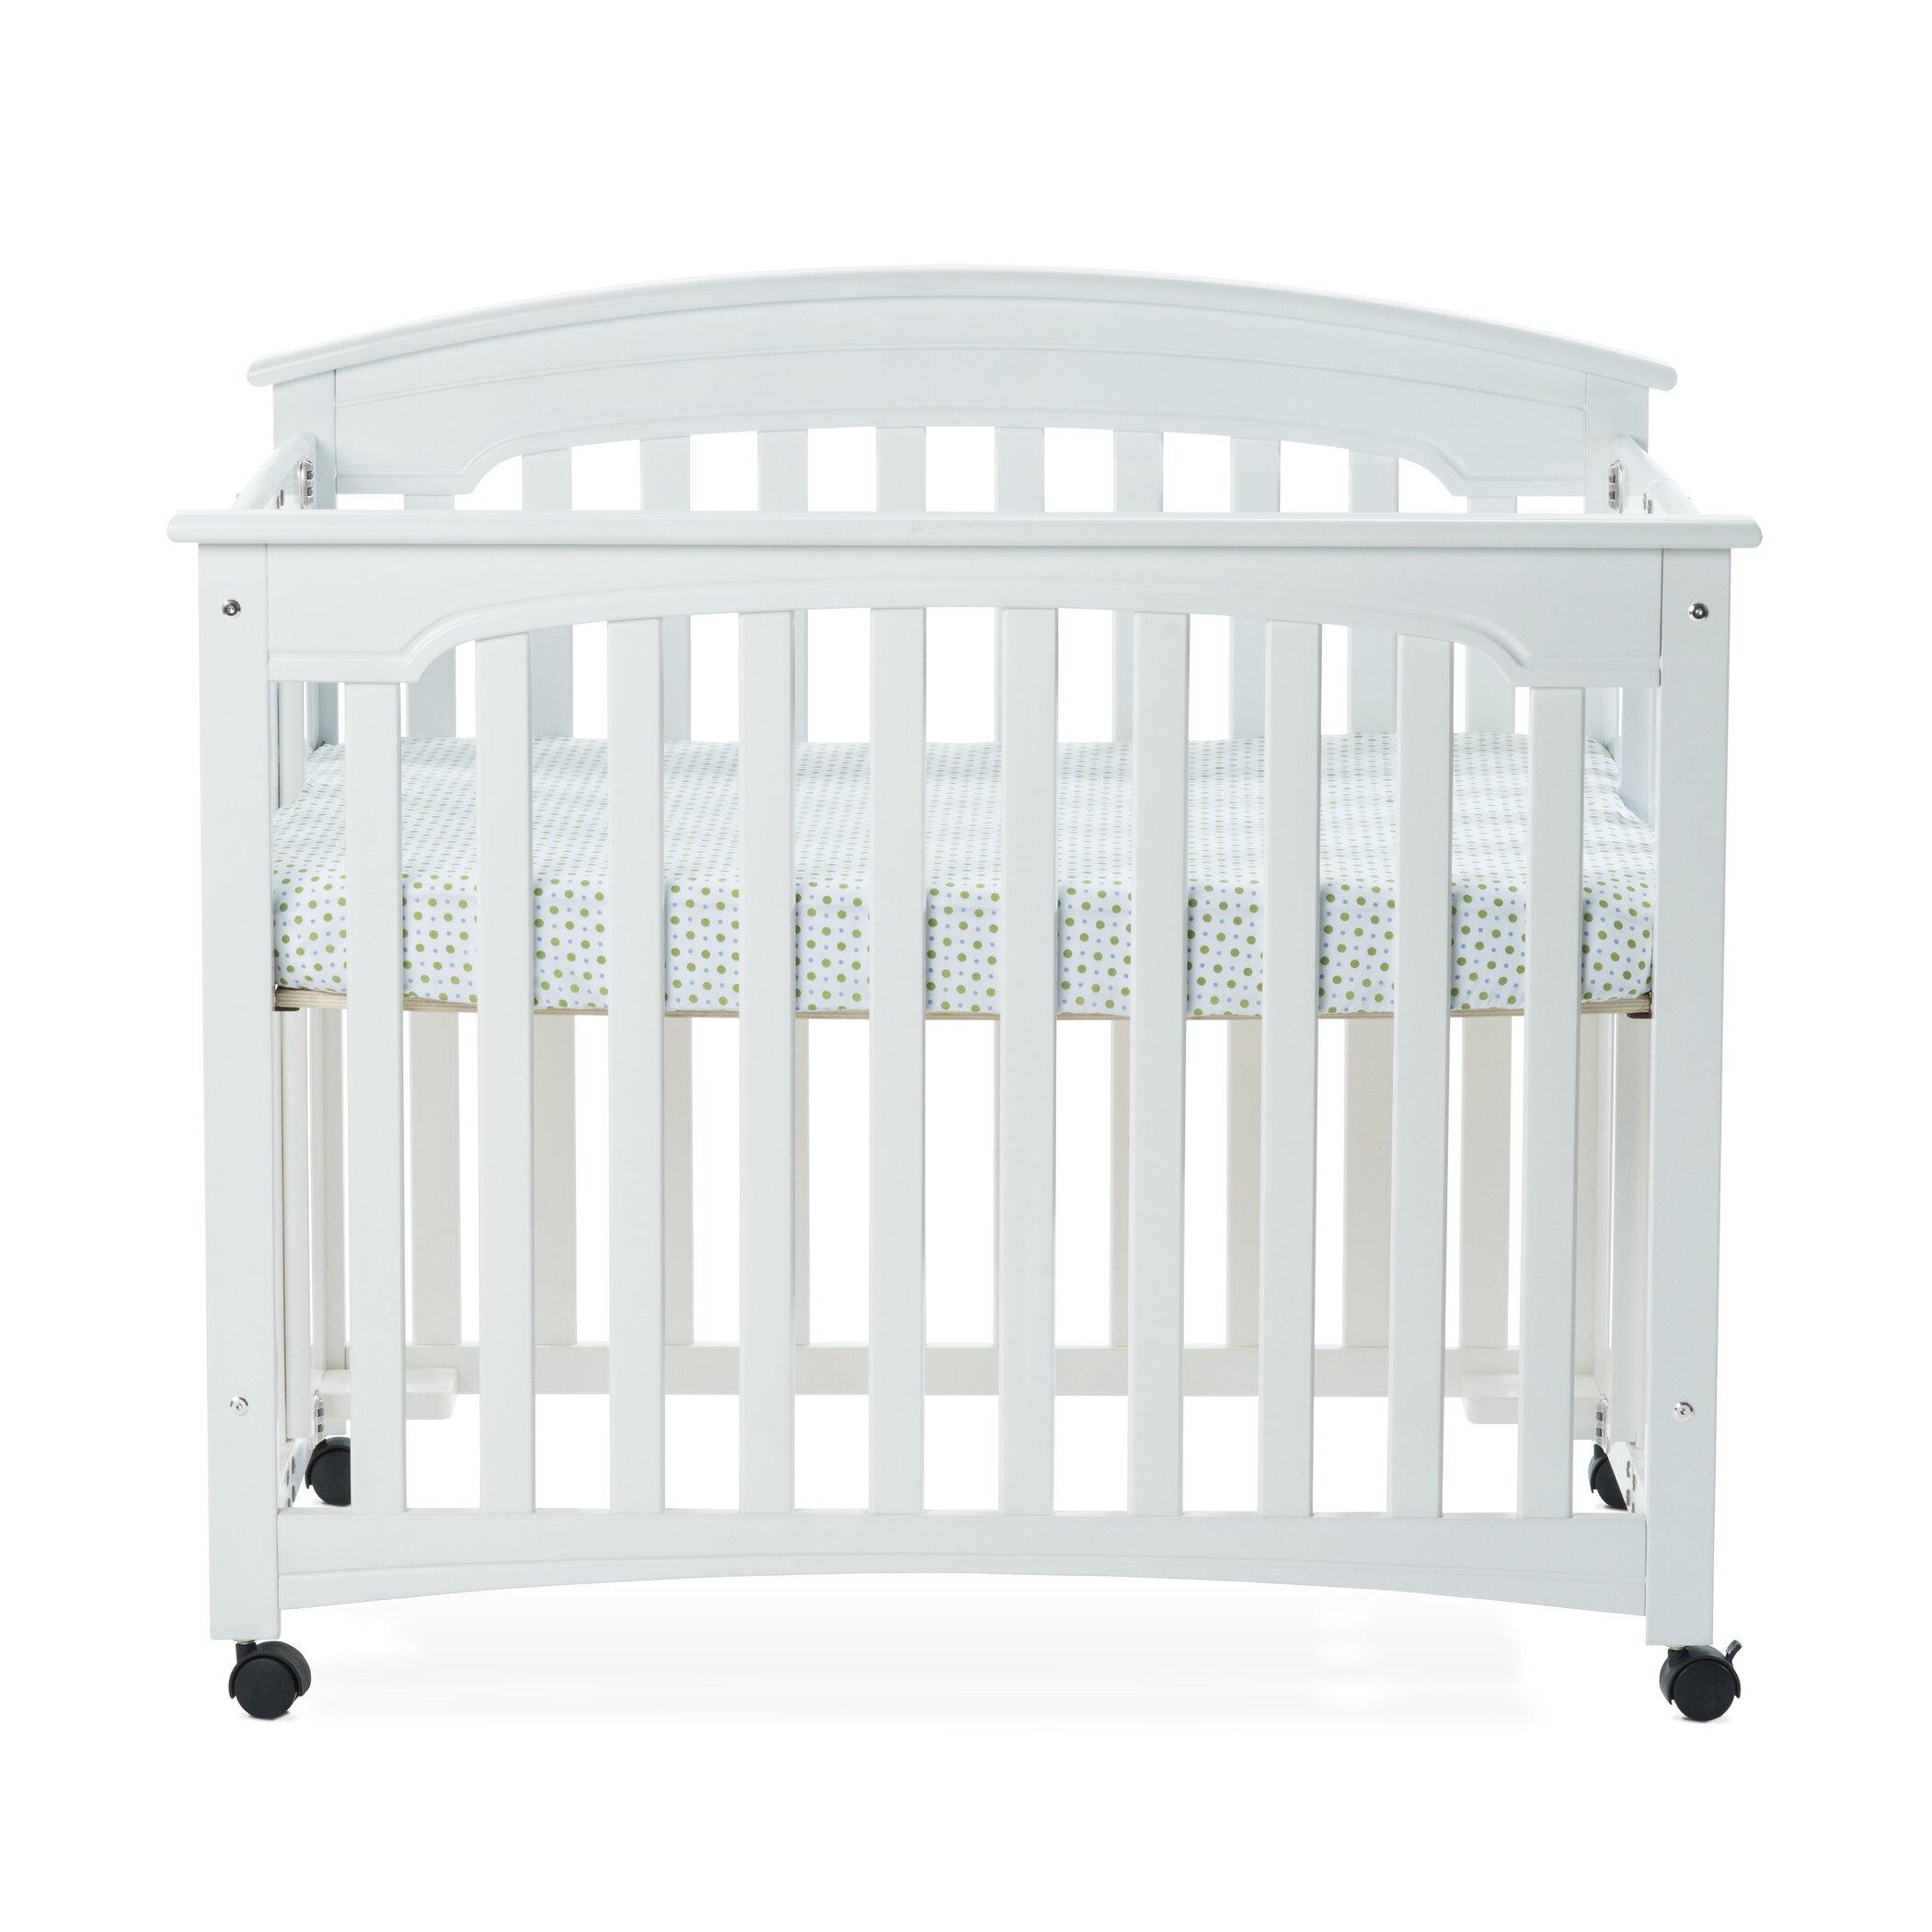 Baby crib mattress dimensions - Child Craft Stanford Mini Folding Crib With Mattress